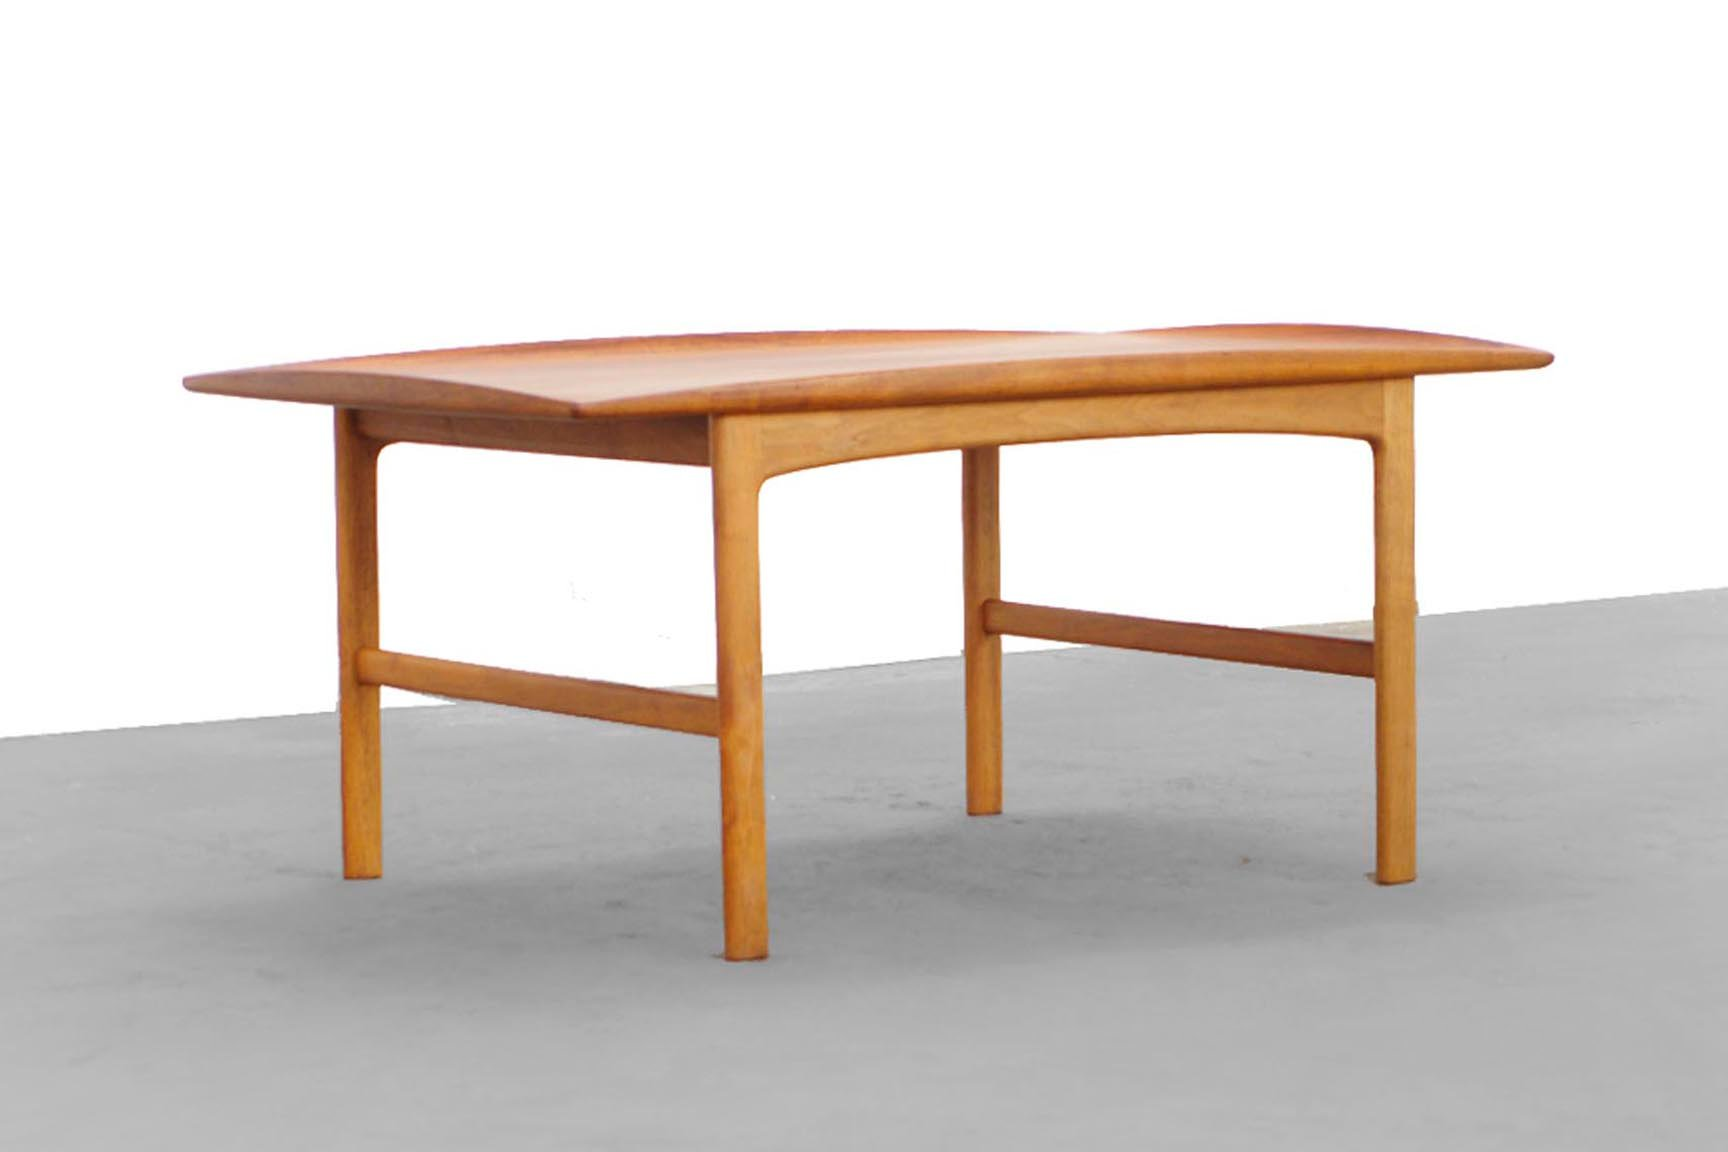 Swedish Teak Coffee Table By Folke Ohlsson For Tingstr Ms